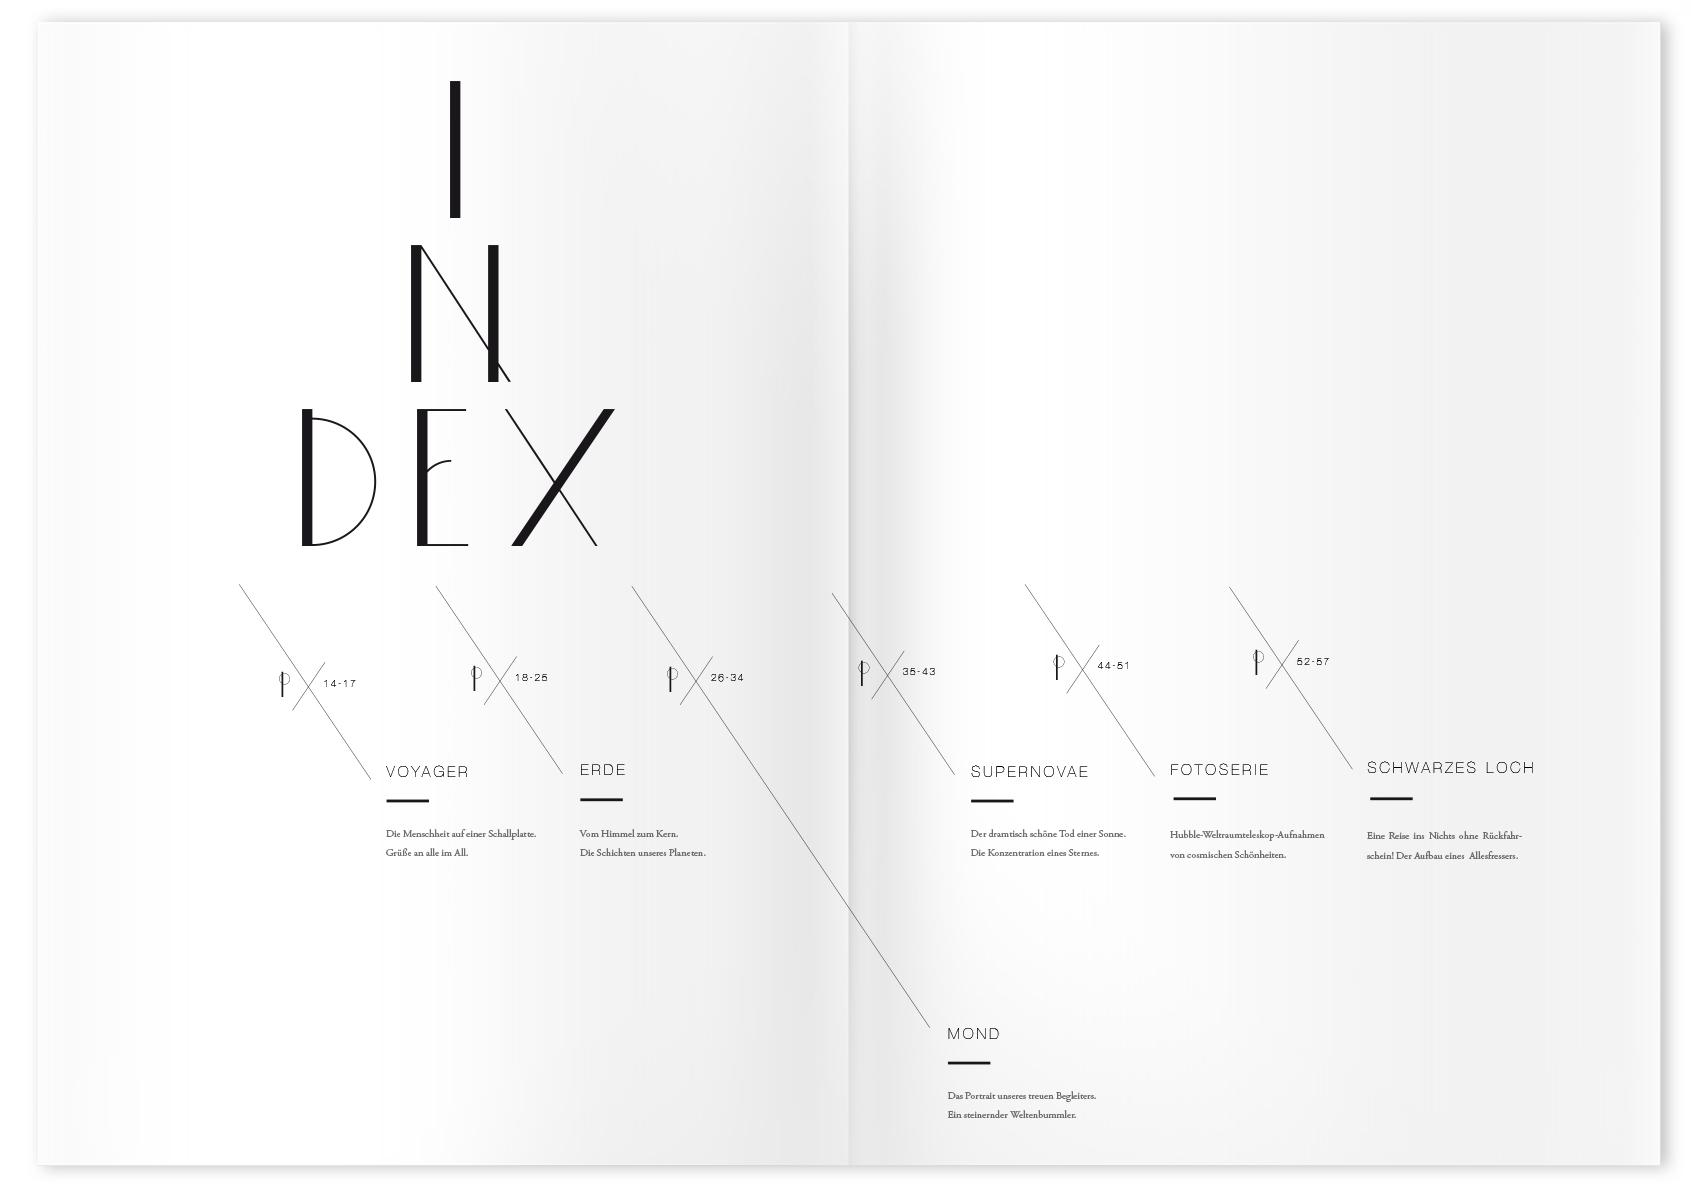 01_Cosmos-Magazin_hsrm-Hochschule-RheinMain_Editorial-Design_Grafikdesign_Gloria-Kison.jpg